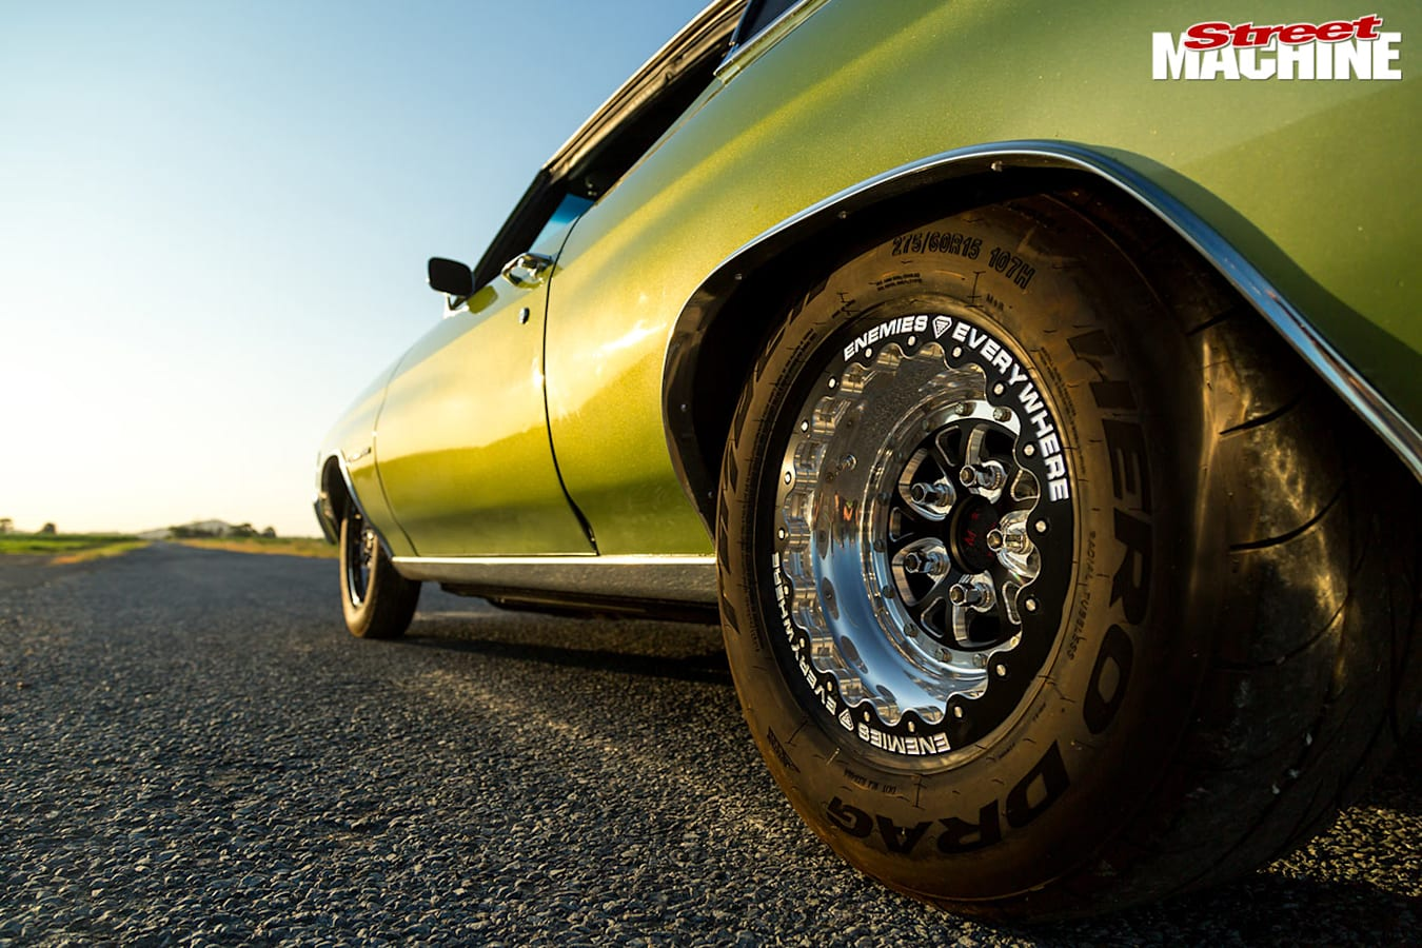 Chevrolet Chevelle rear wheel